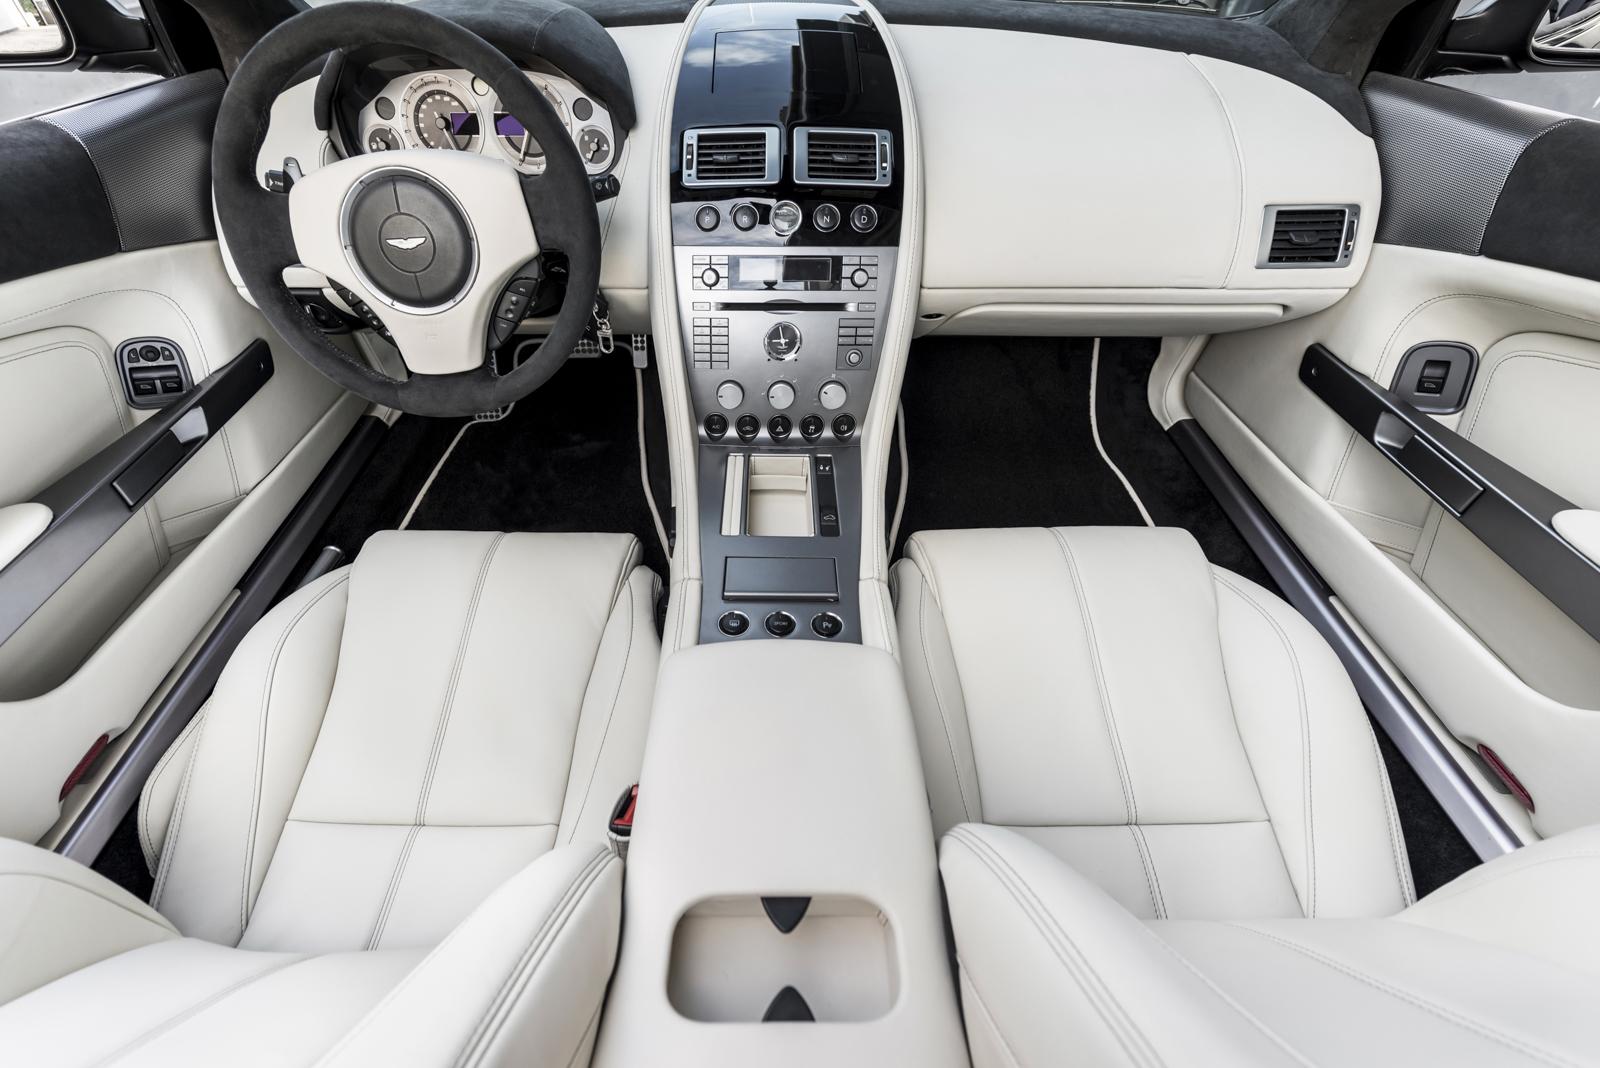 Aston Martin BD9